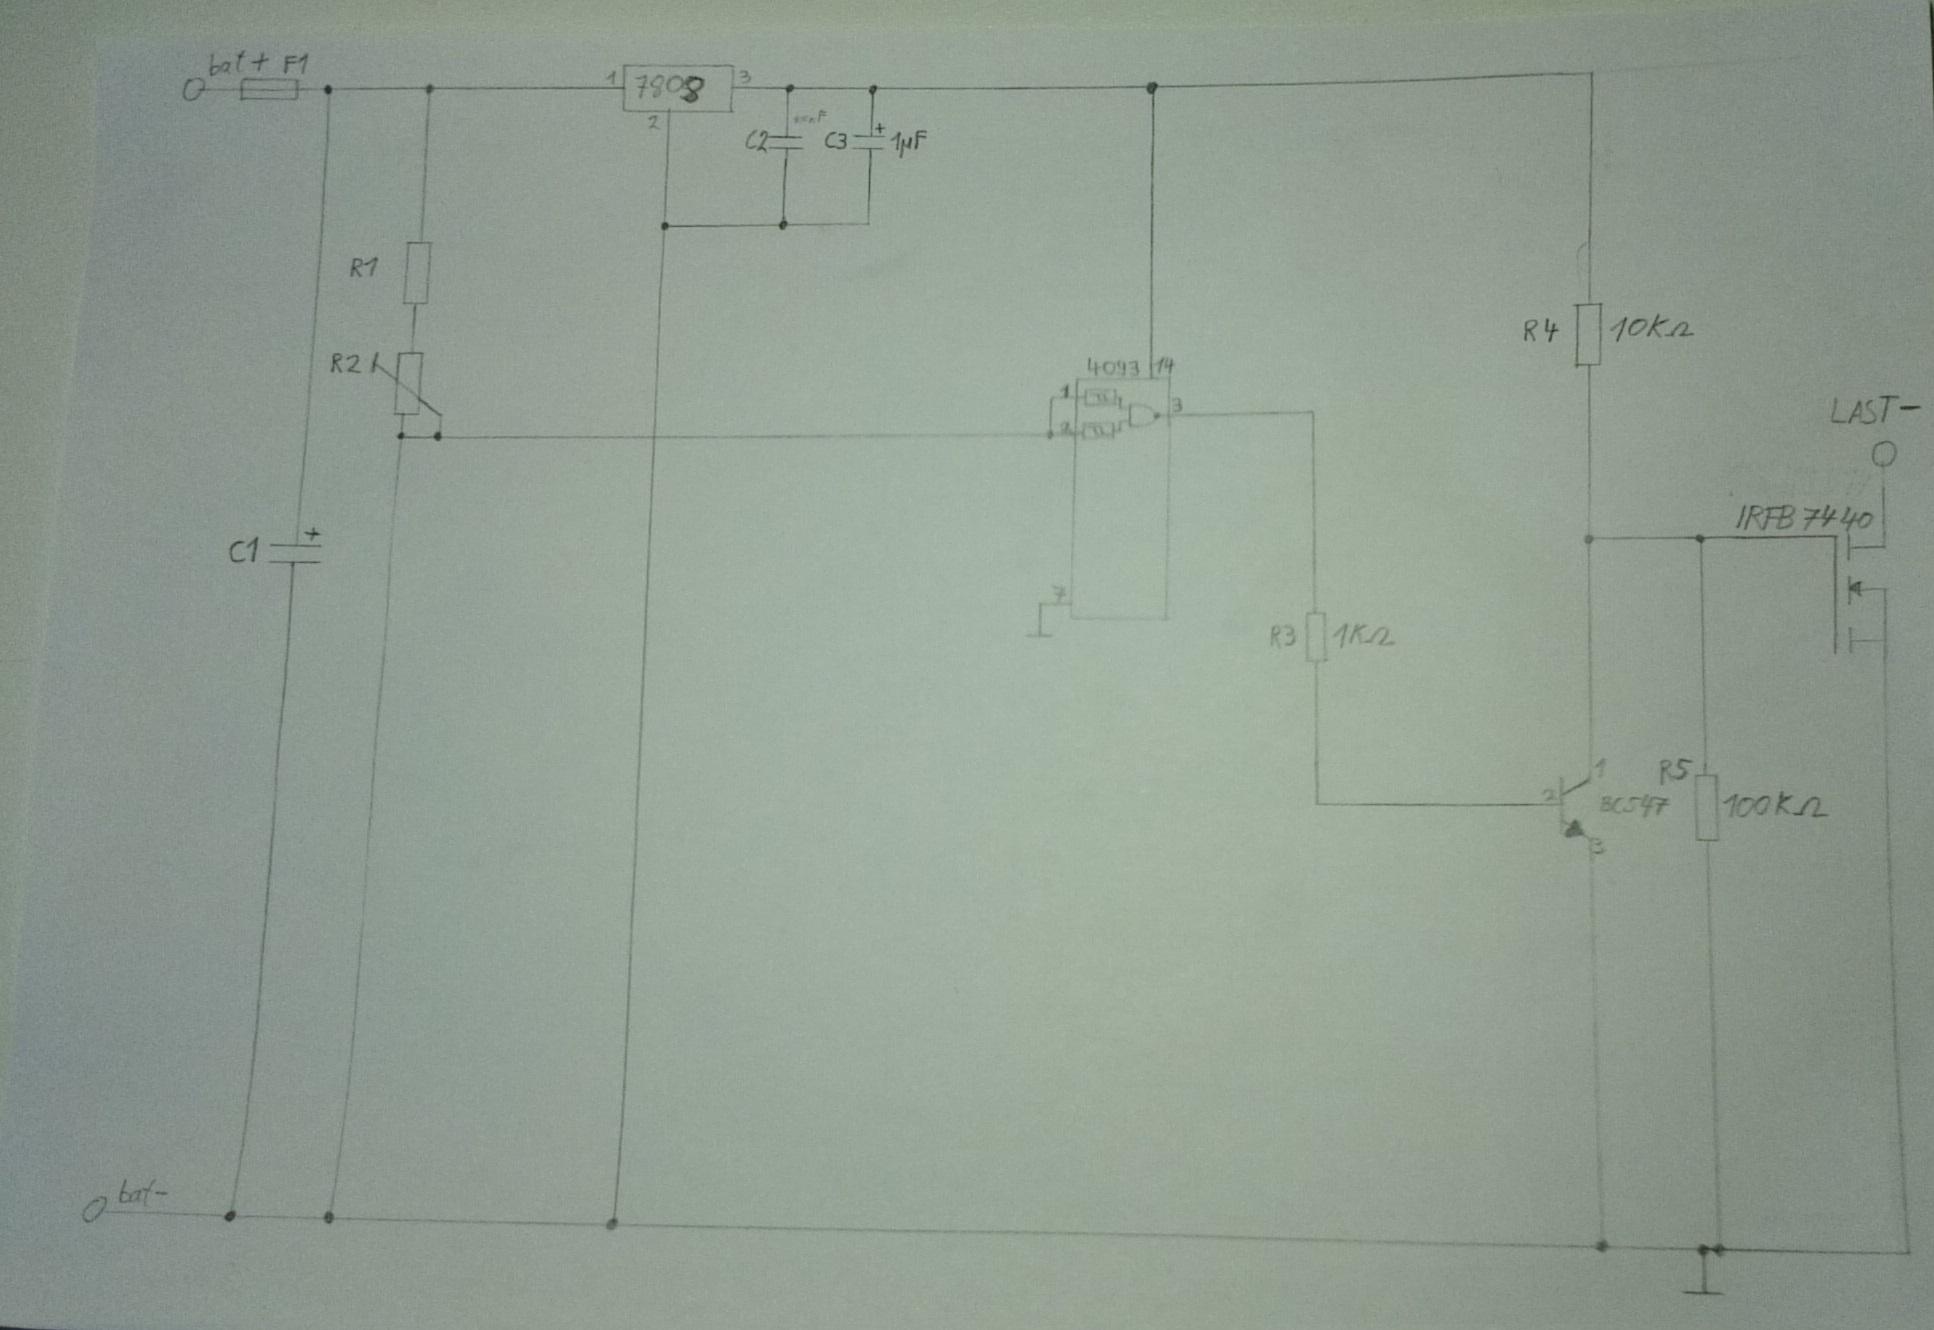 Charmant Diagramme Nummer Modell Verdrahtung Bohn Bht030h2b ...